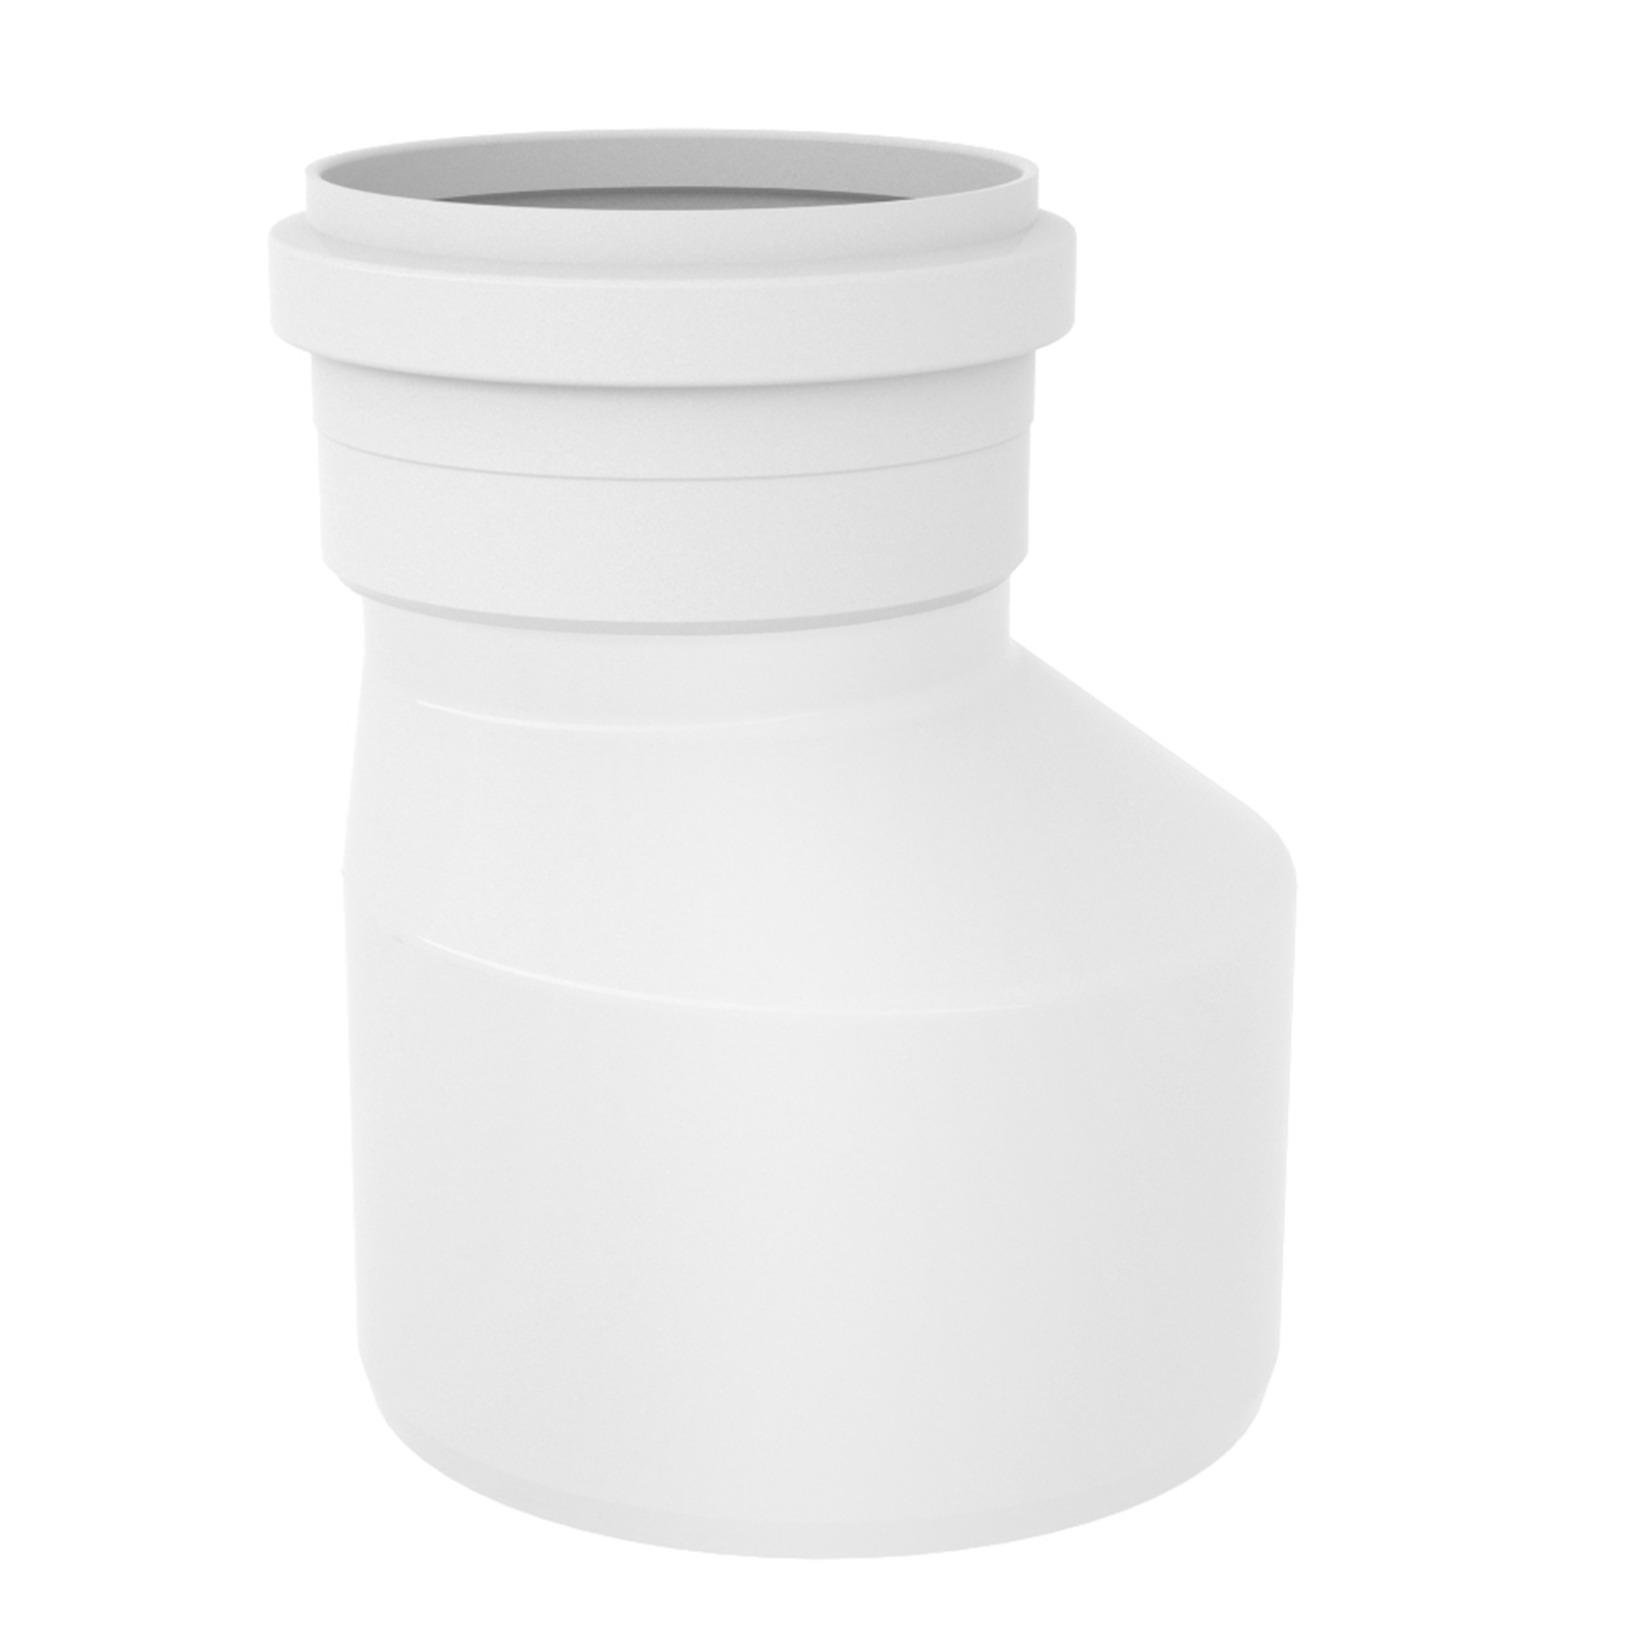 Reducao Excentrica para Esgoto PVC Branco 200 mm x 150 mm - Tigre